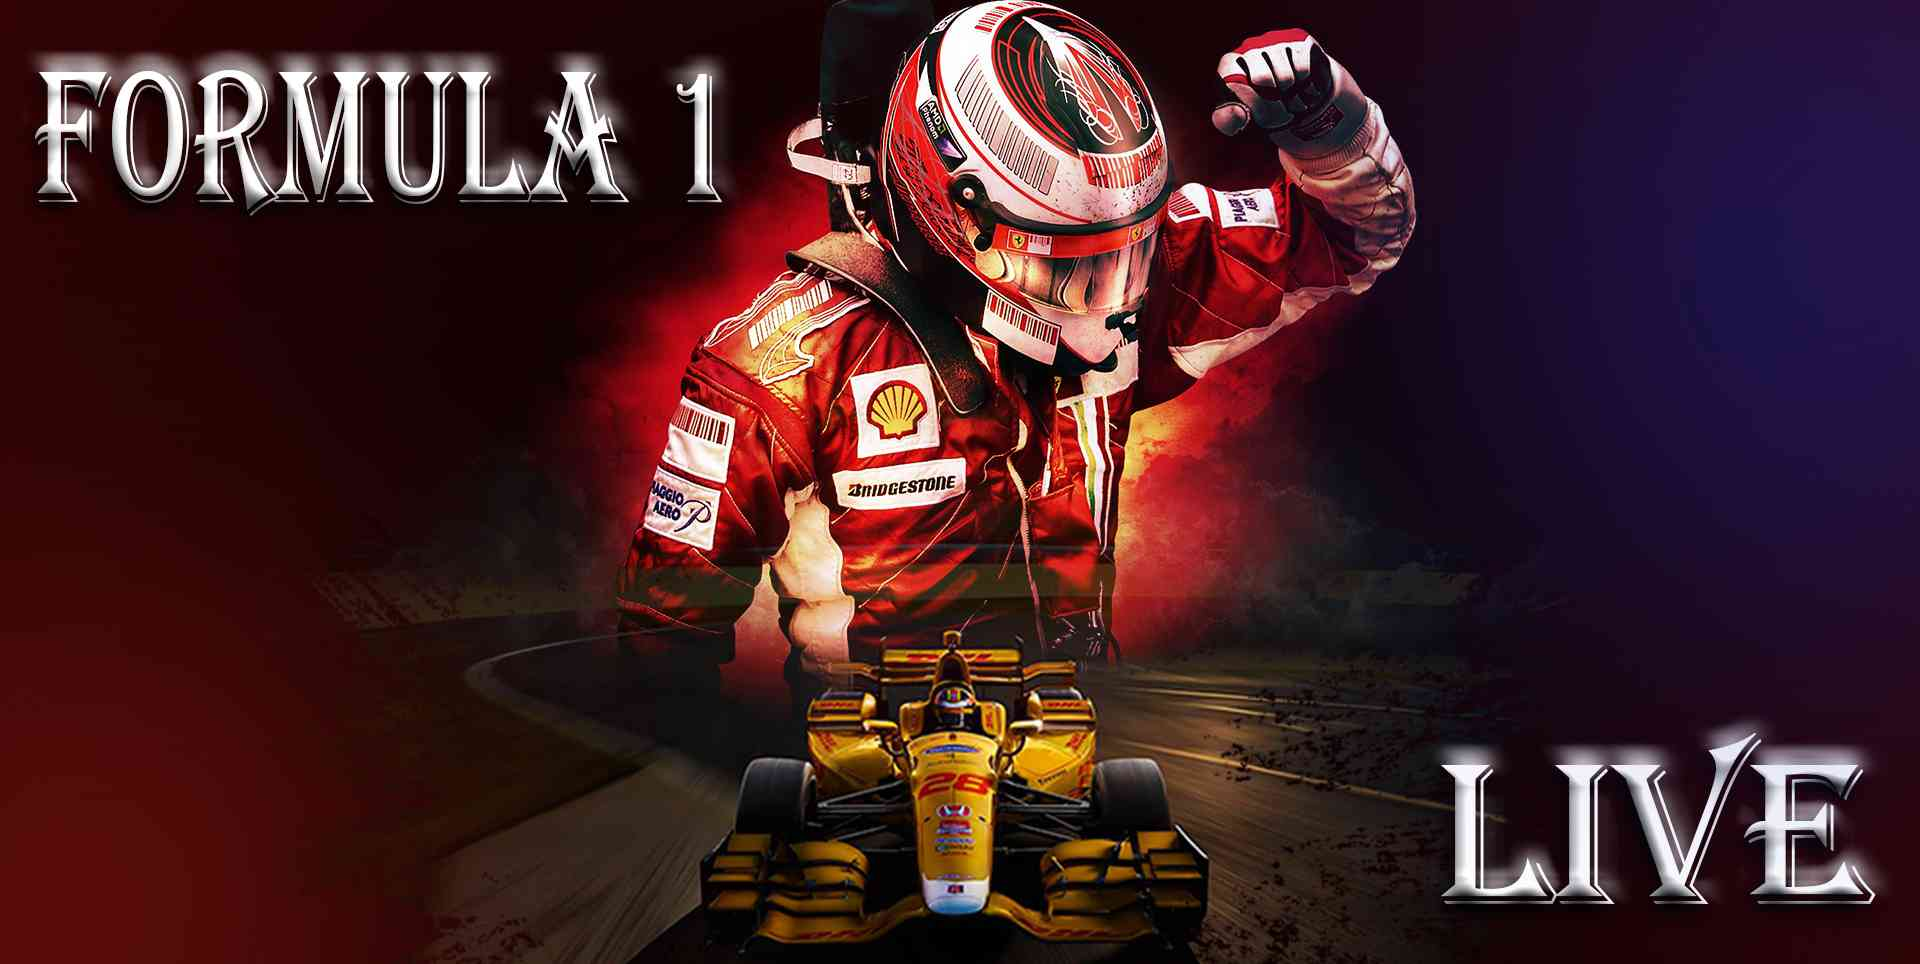 formula-1-hungary-grand-prix-2015-online